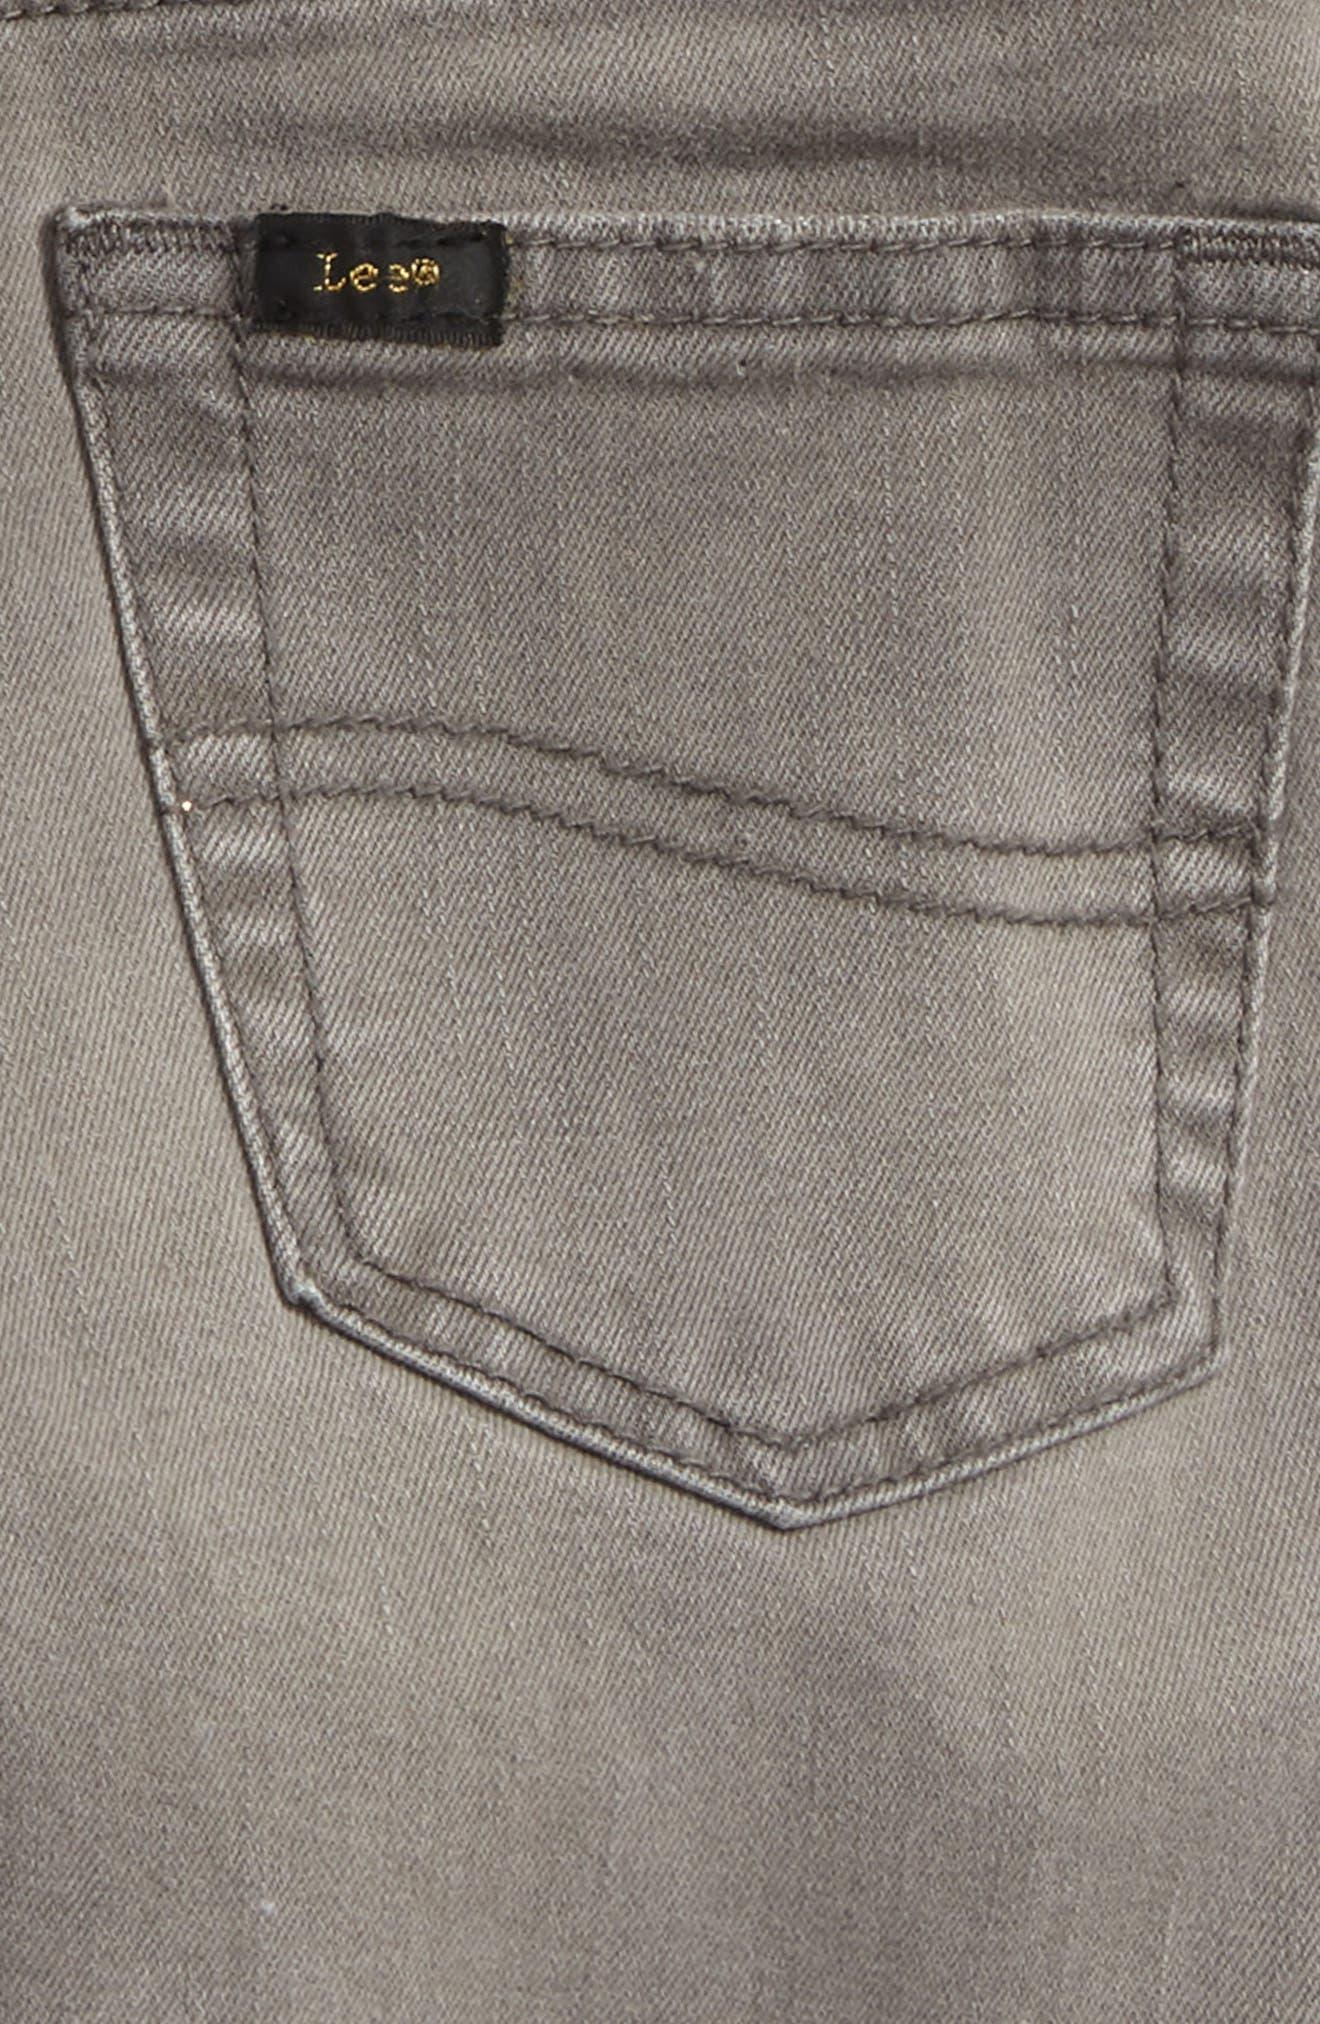 Stretch Denim Roll Cuff Shorts,                             Alternate thumbnail 3, color,                             060